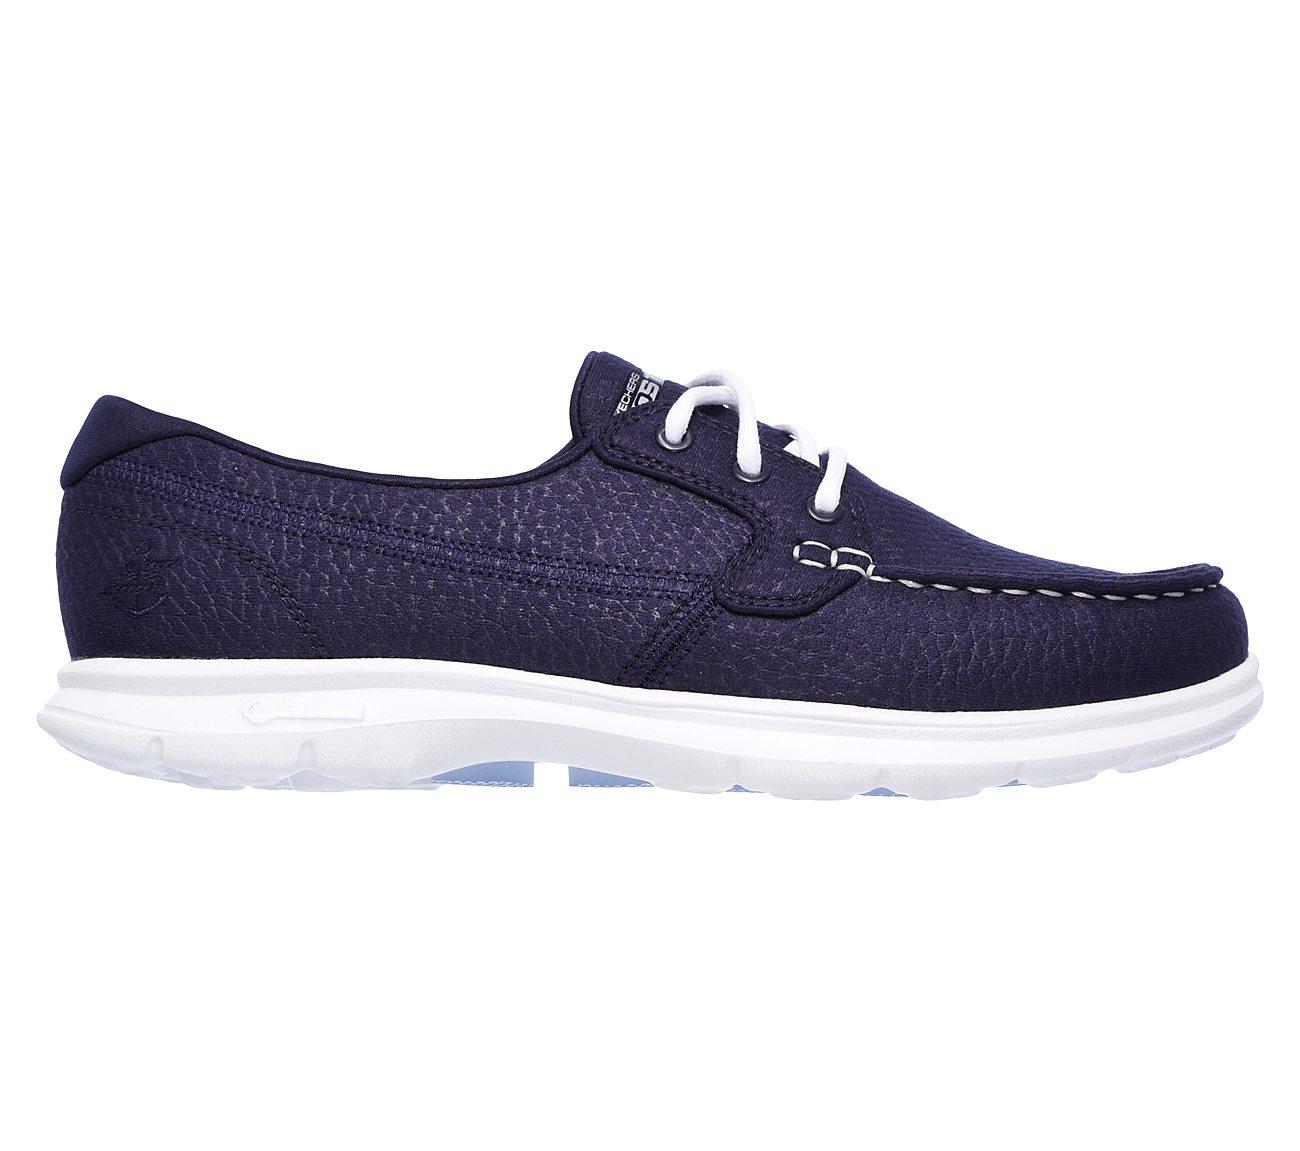 6dae03fa844a5 Buy SKECHERS Skechers GO STEP - Riptide Skechers Performance Shoes ...